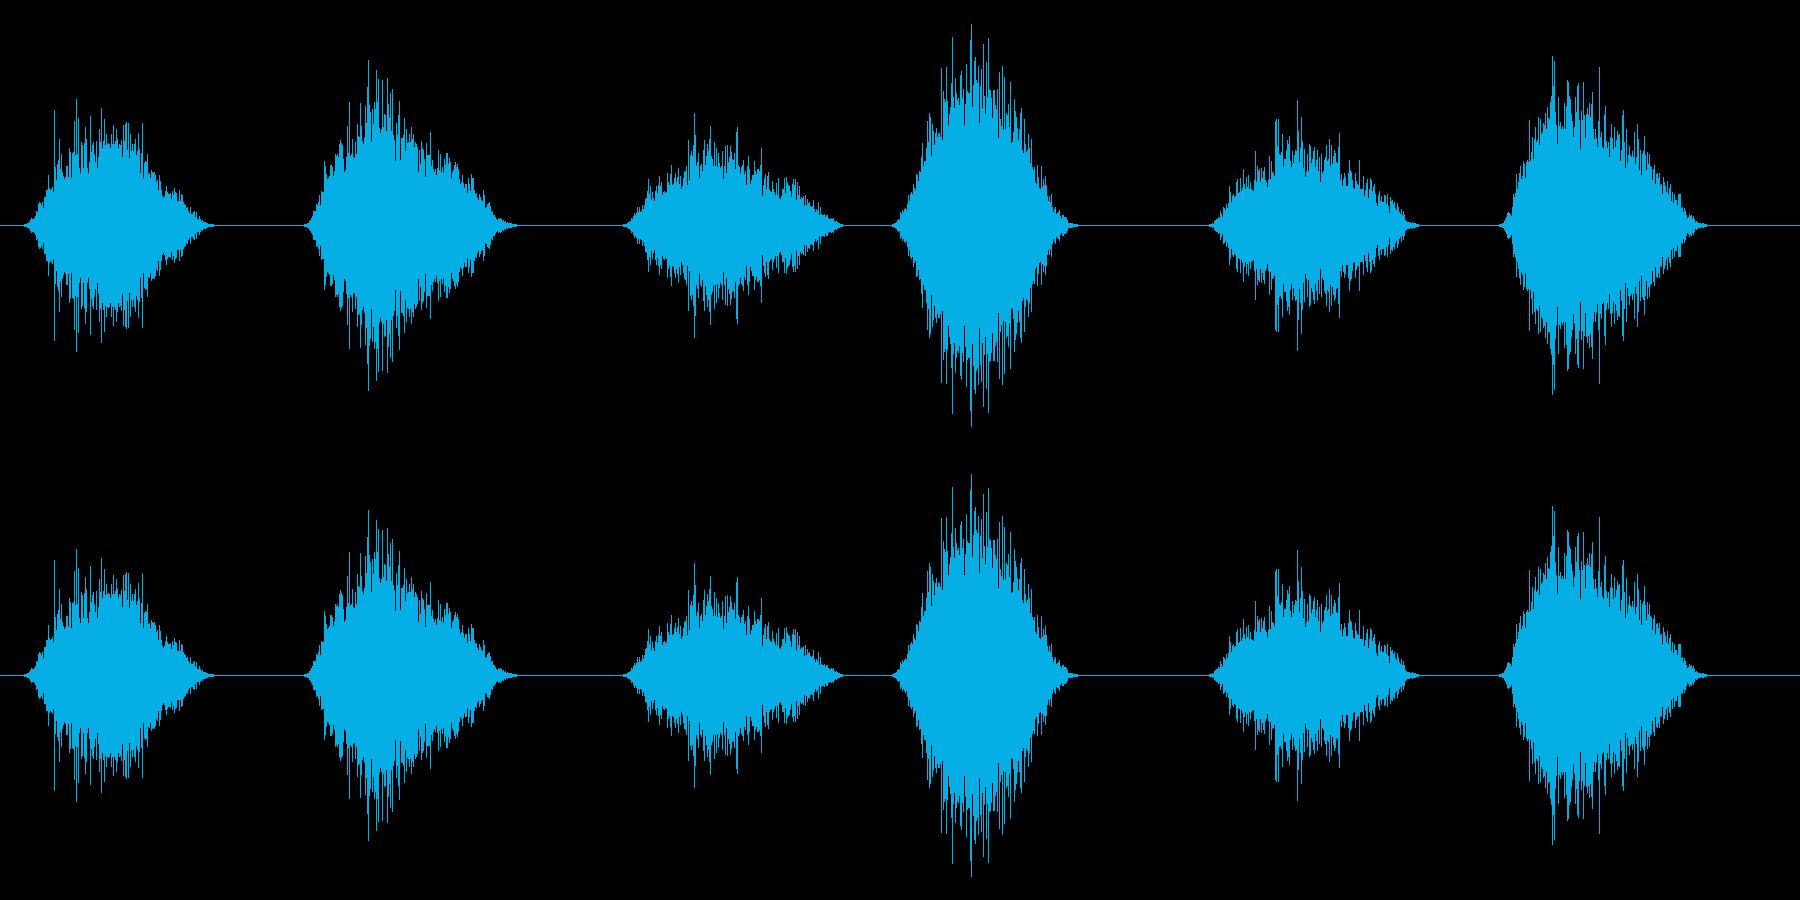 PC マウス ムーブ03-16(ハード)の再生済みの波形